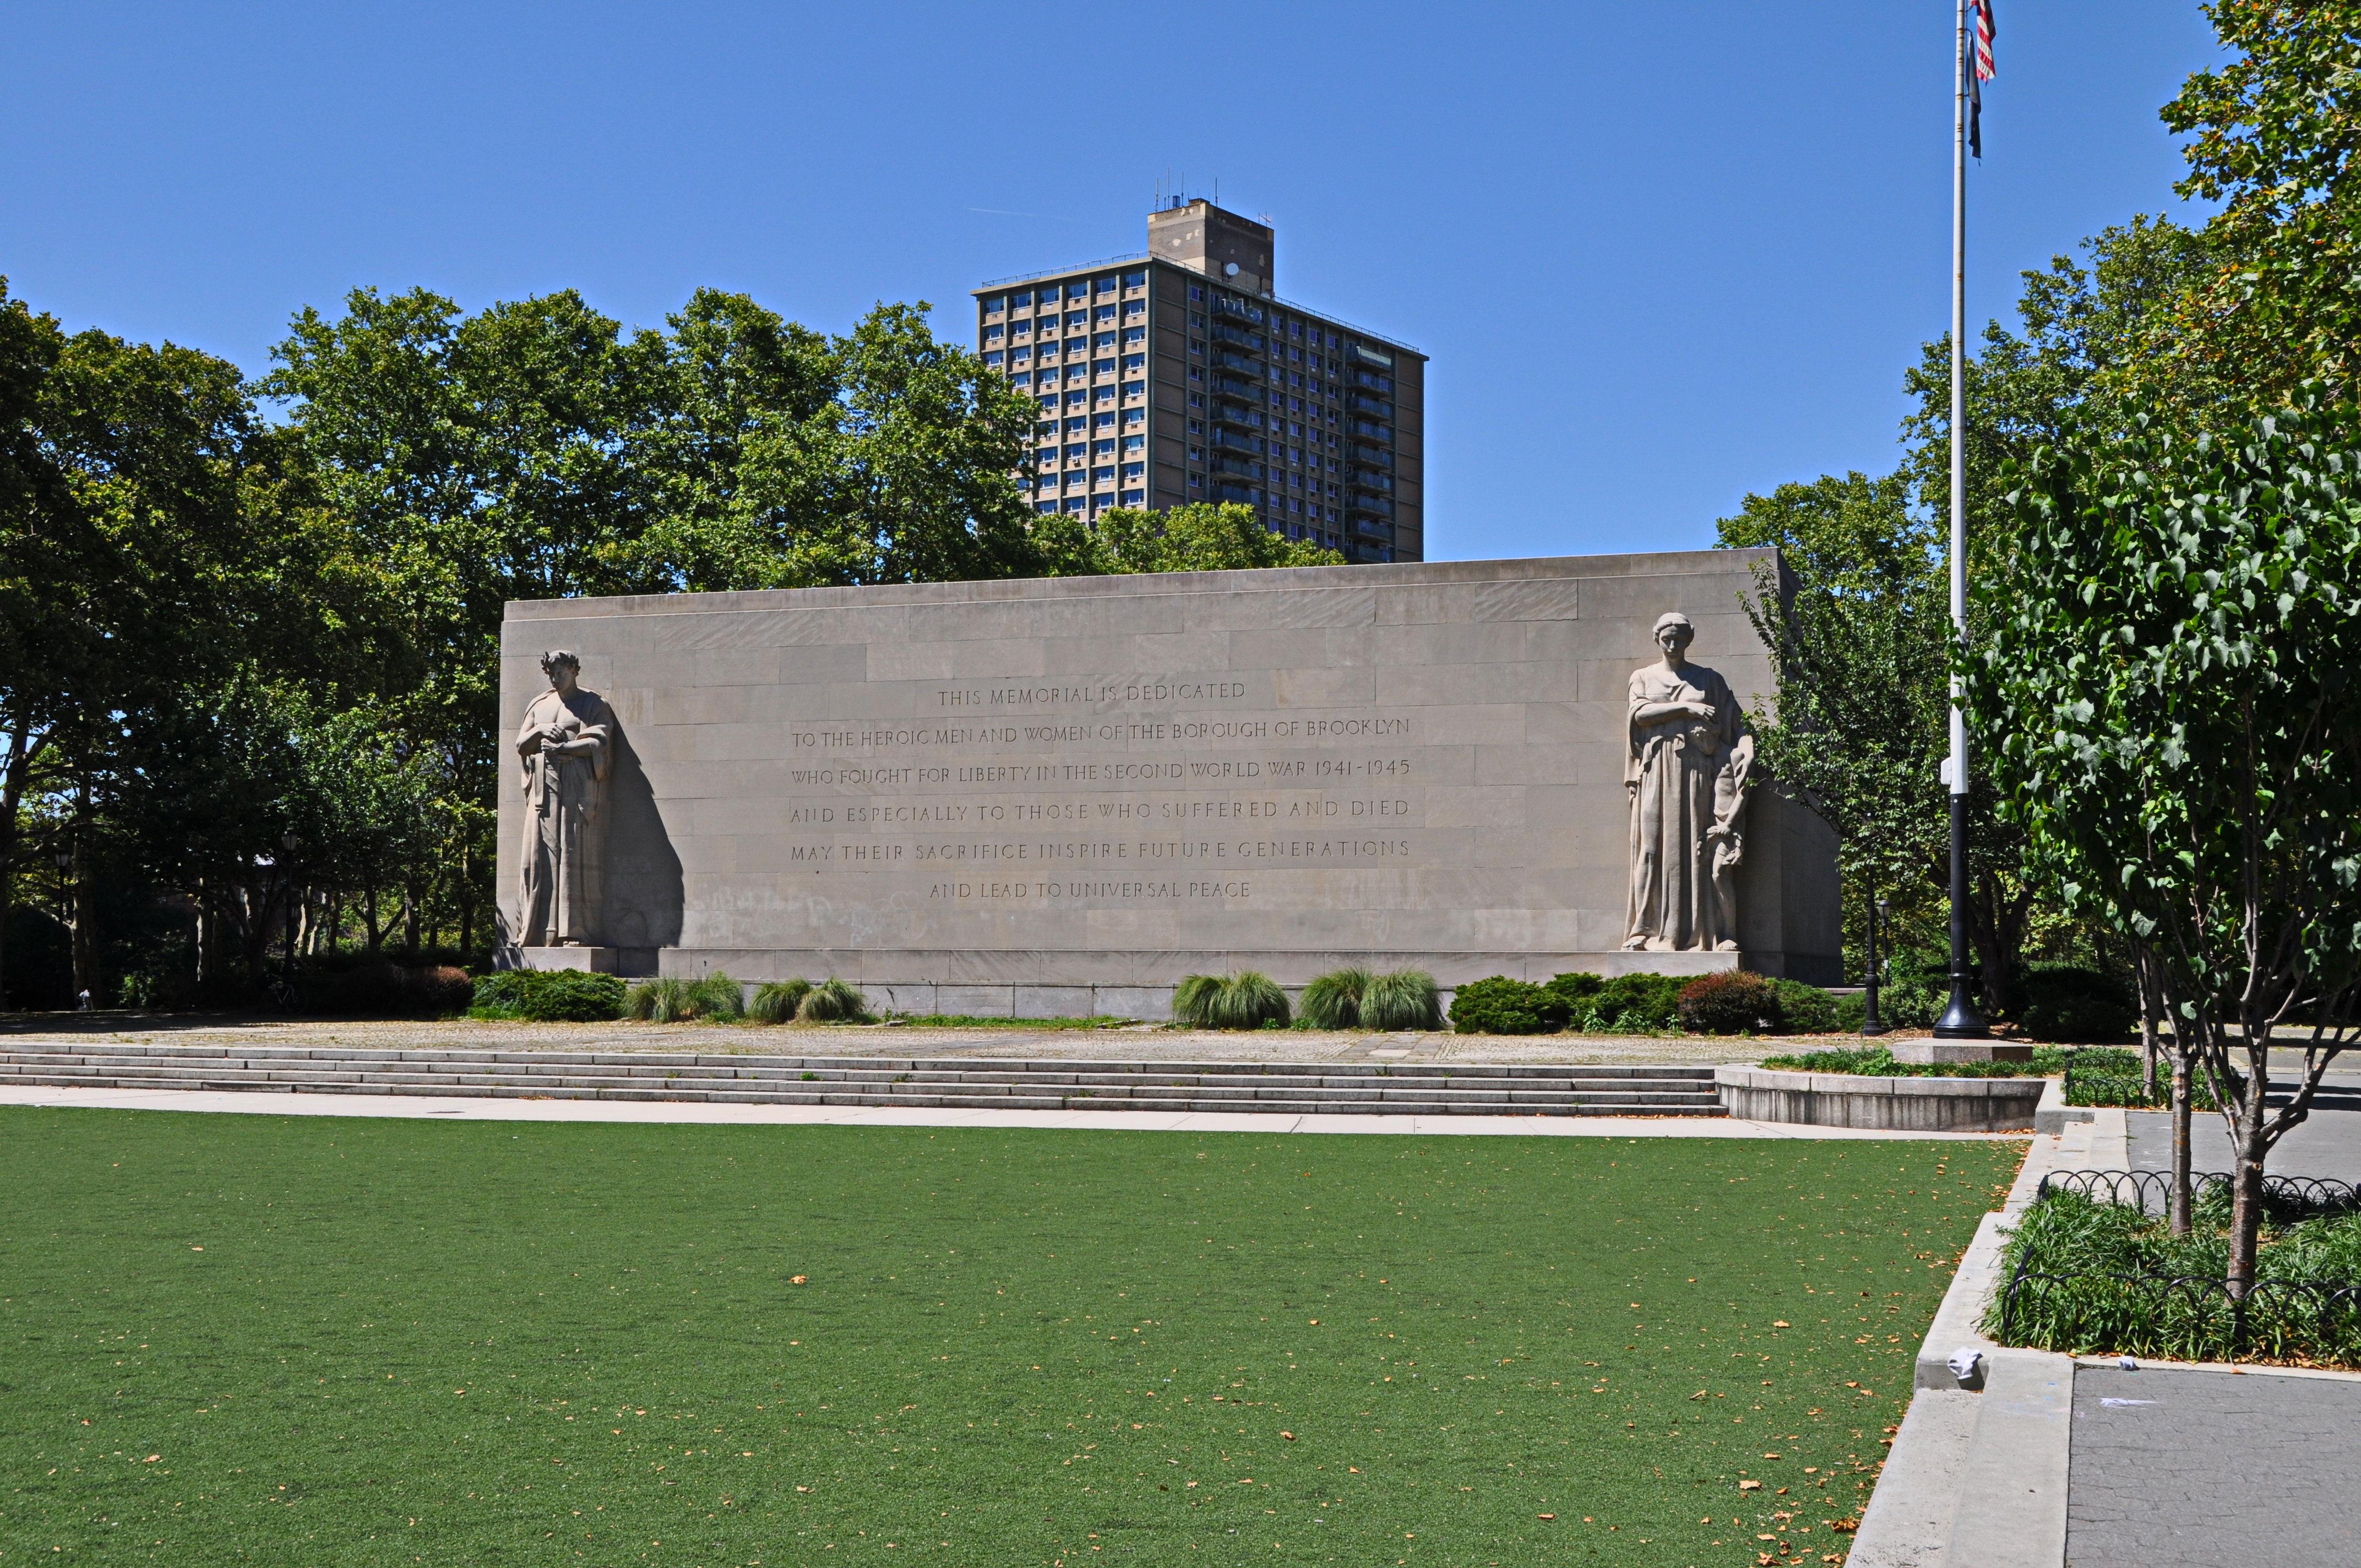 The Brooklyn War Memorial